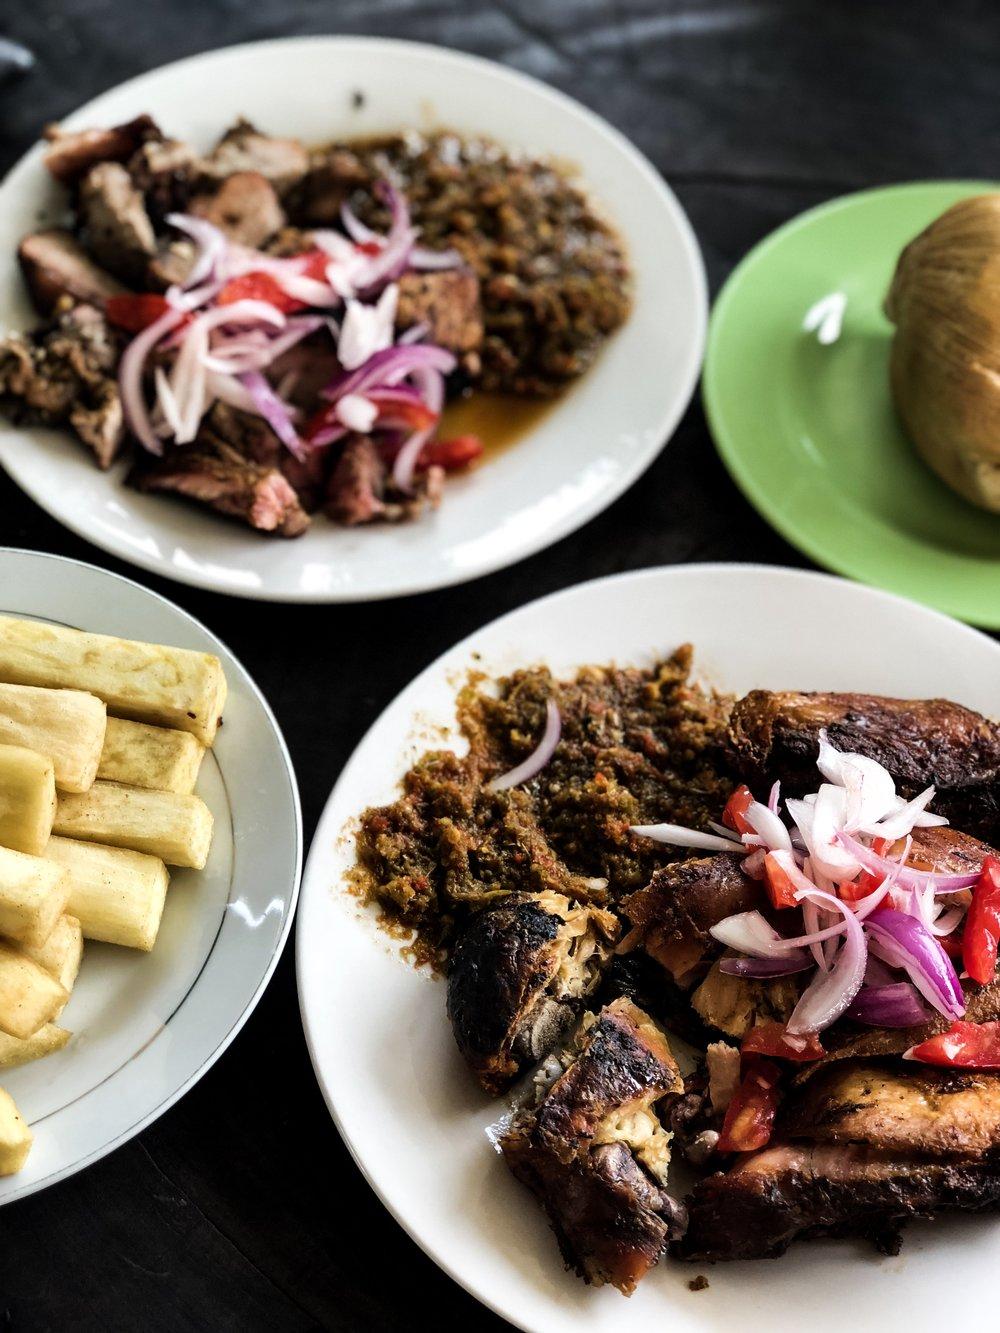 Ghana fried yam and shito